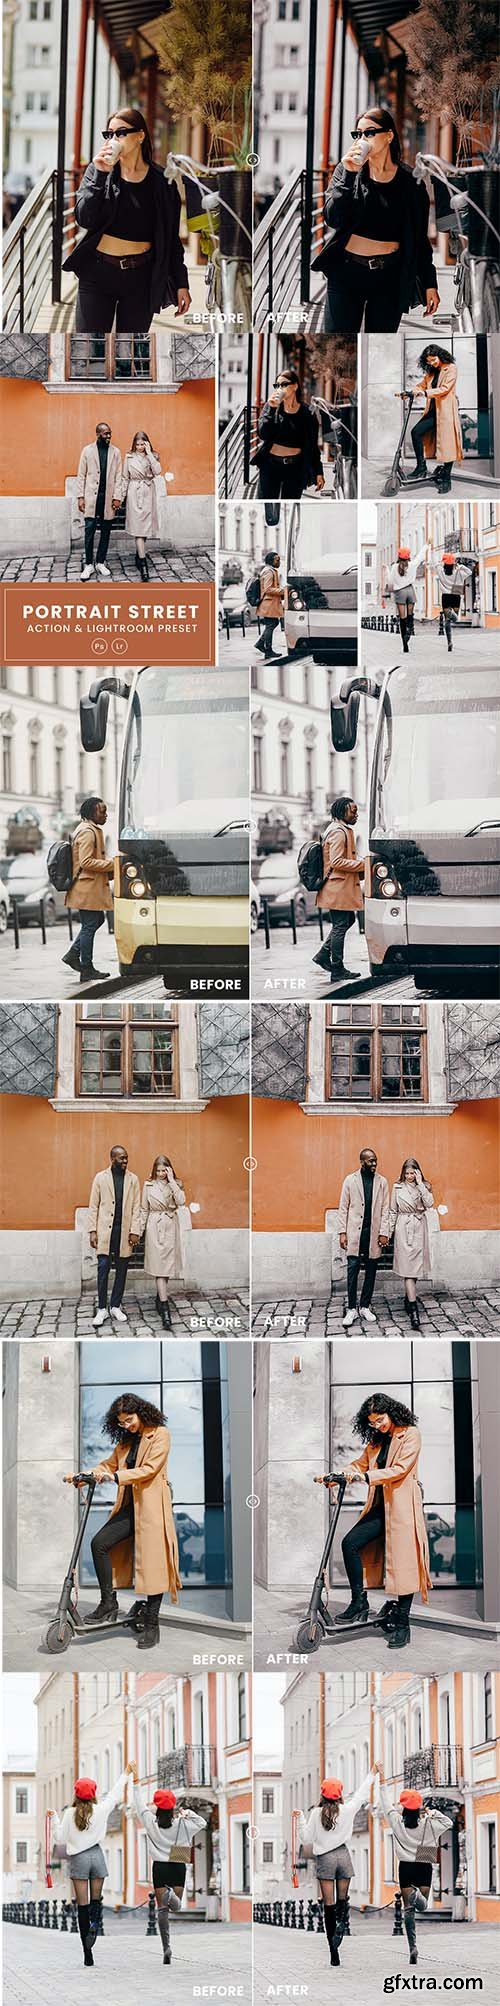 Portrait Street Action & Lightrom Presets